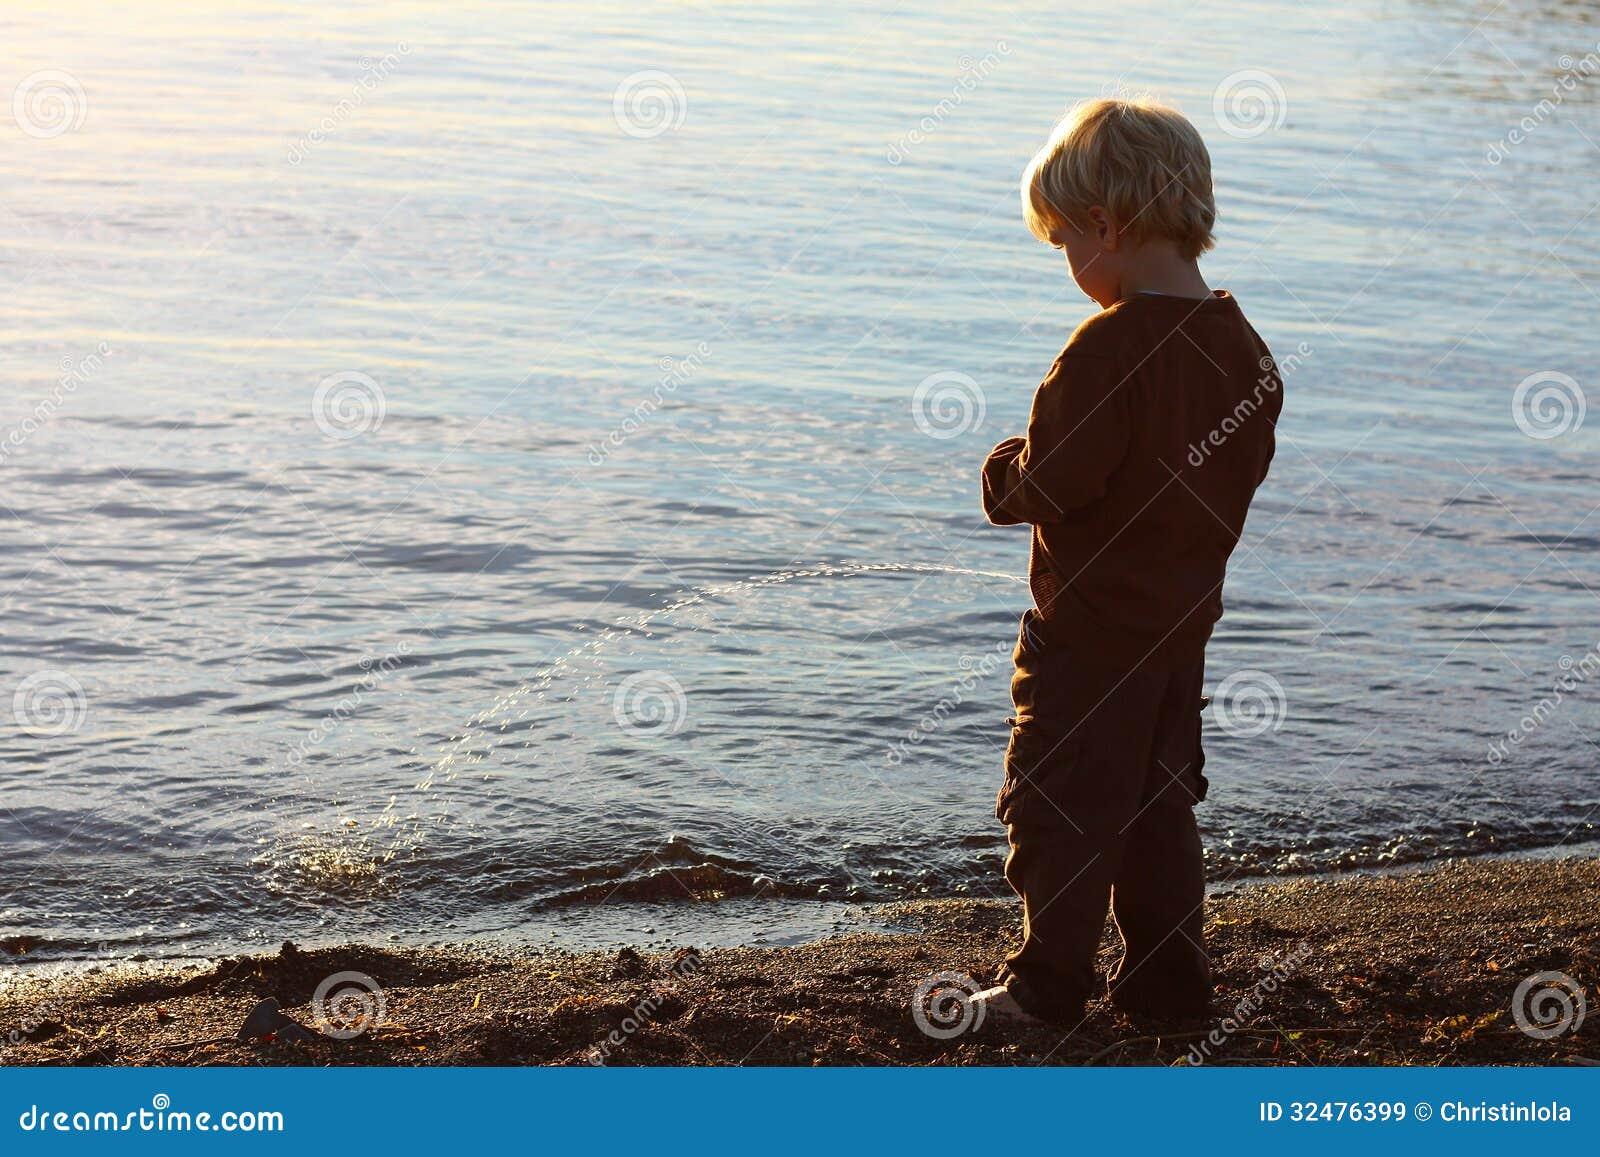 Congratulate, Peeing into lake congratulate